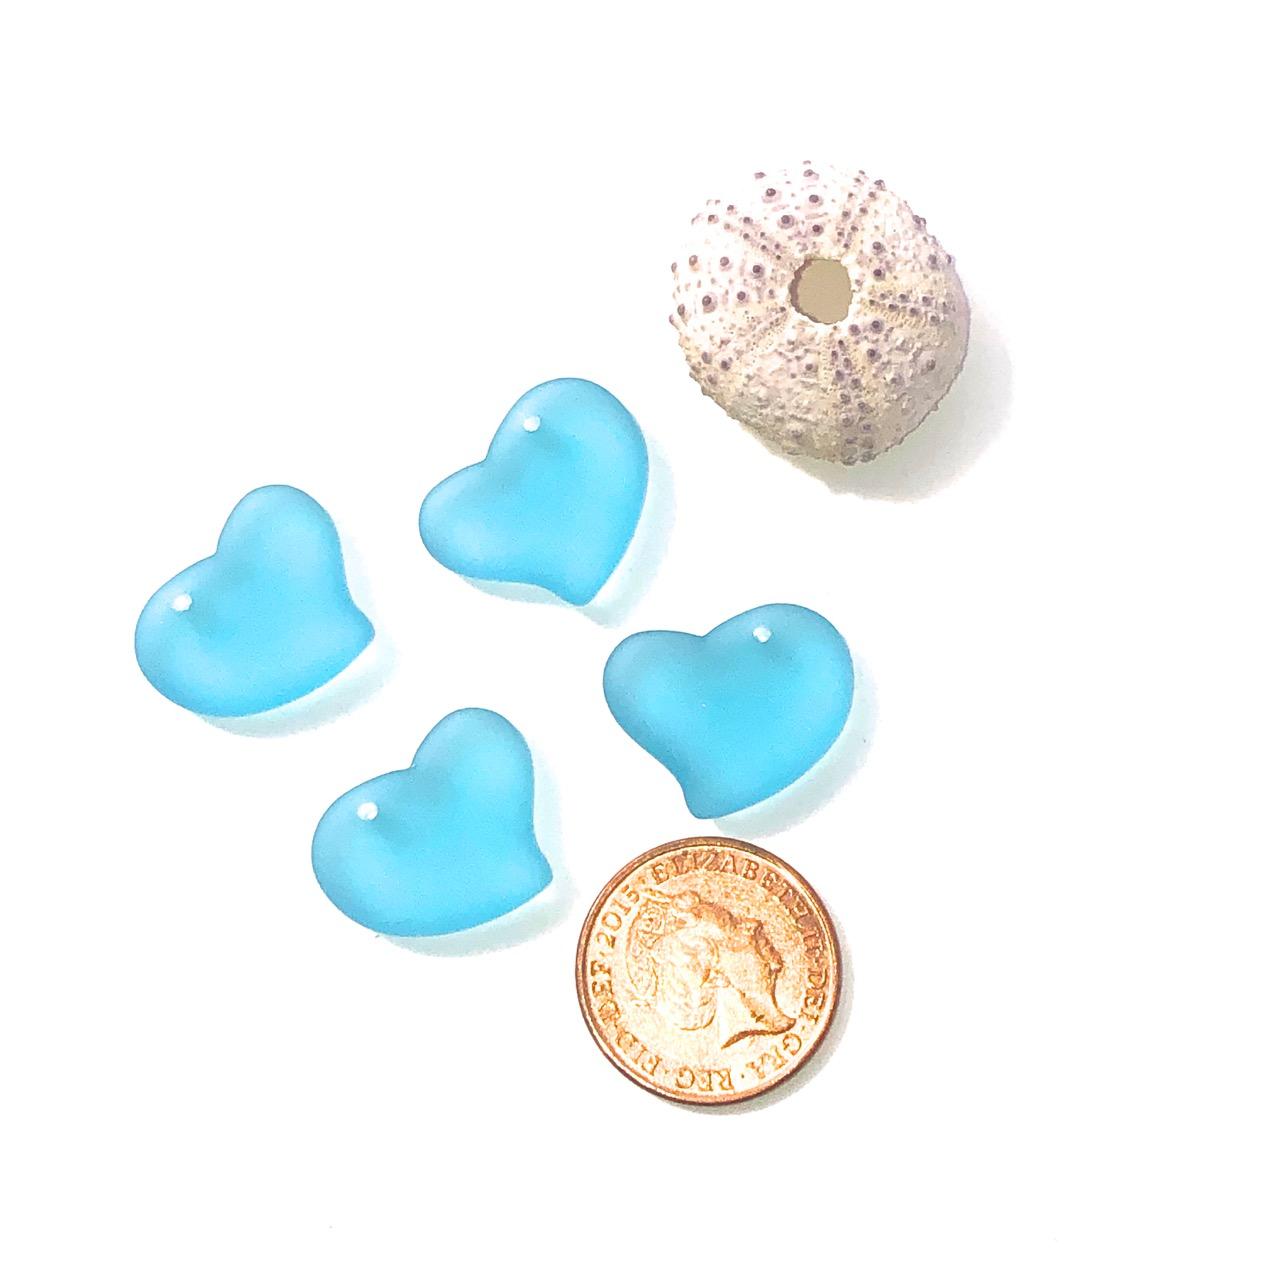 Sea Glass Heart - Turquoise Bay